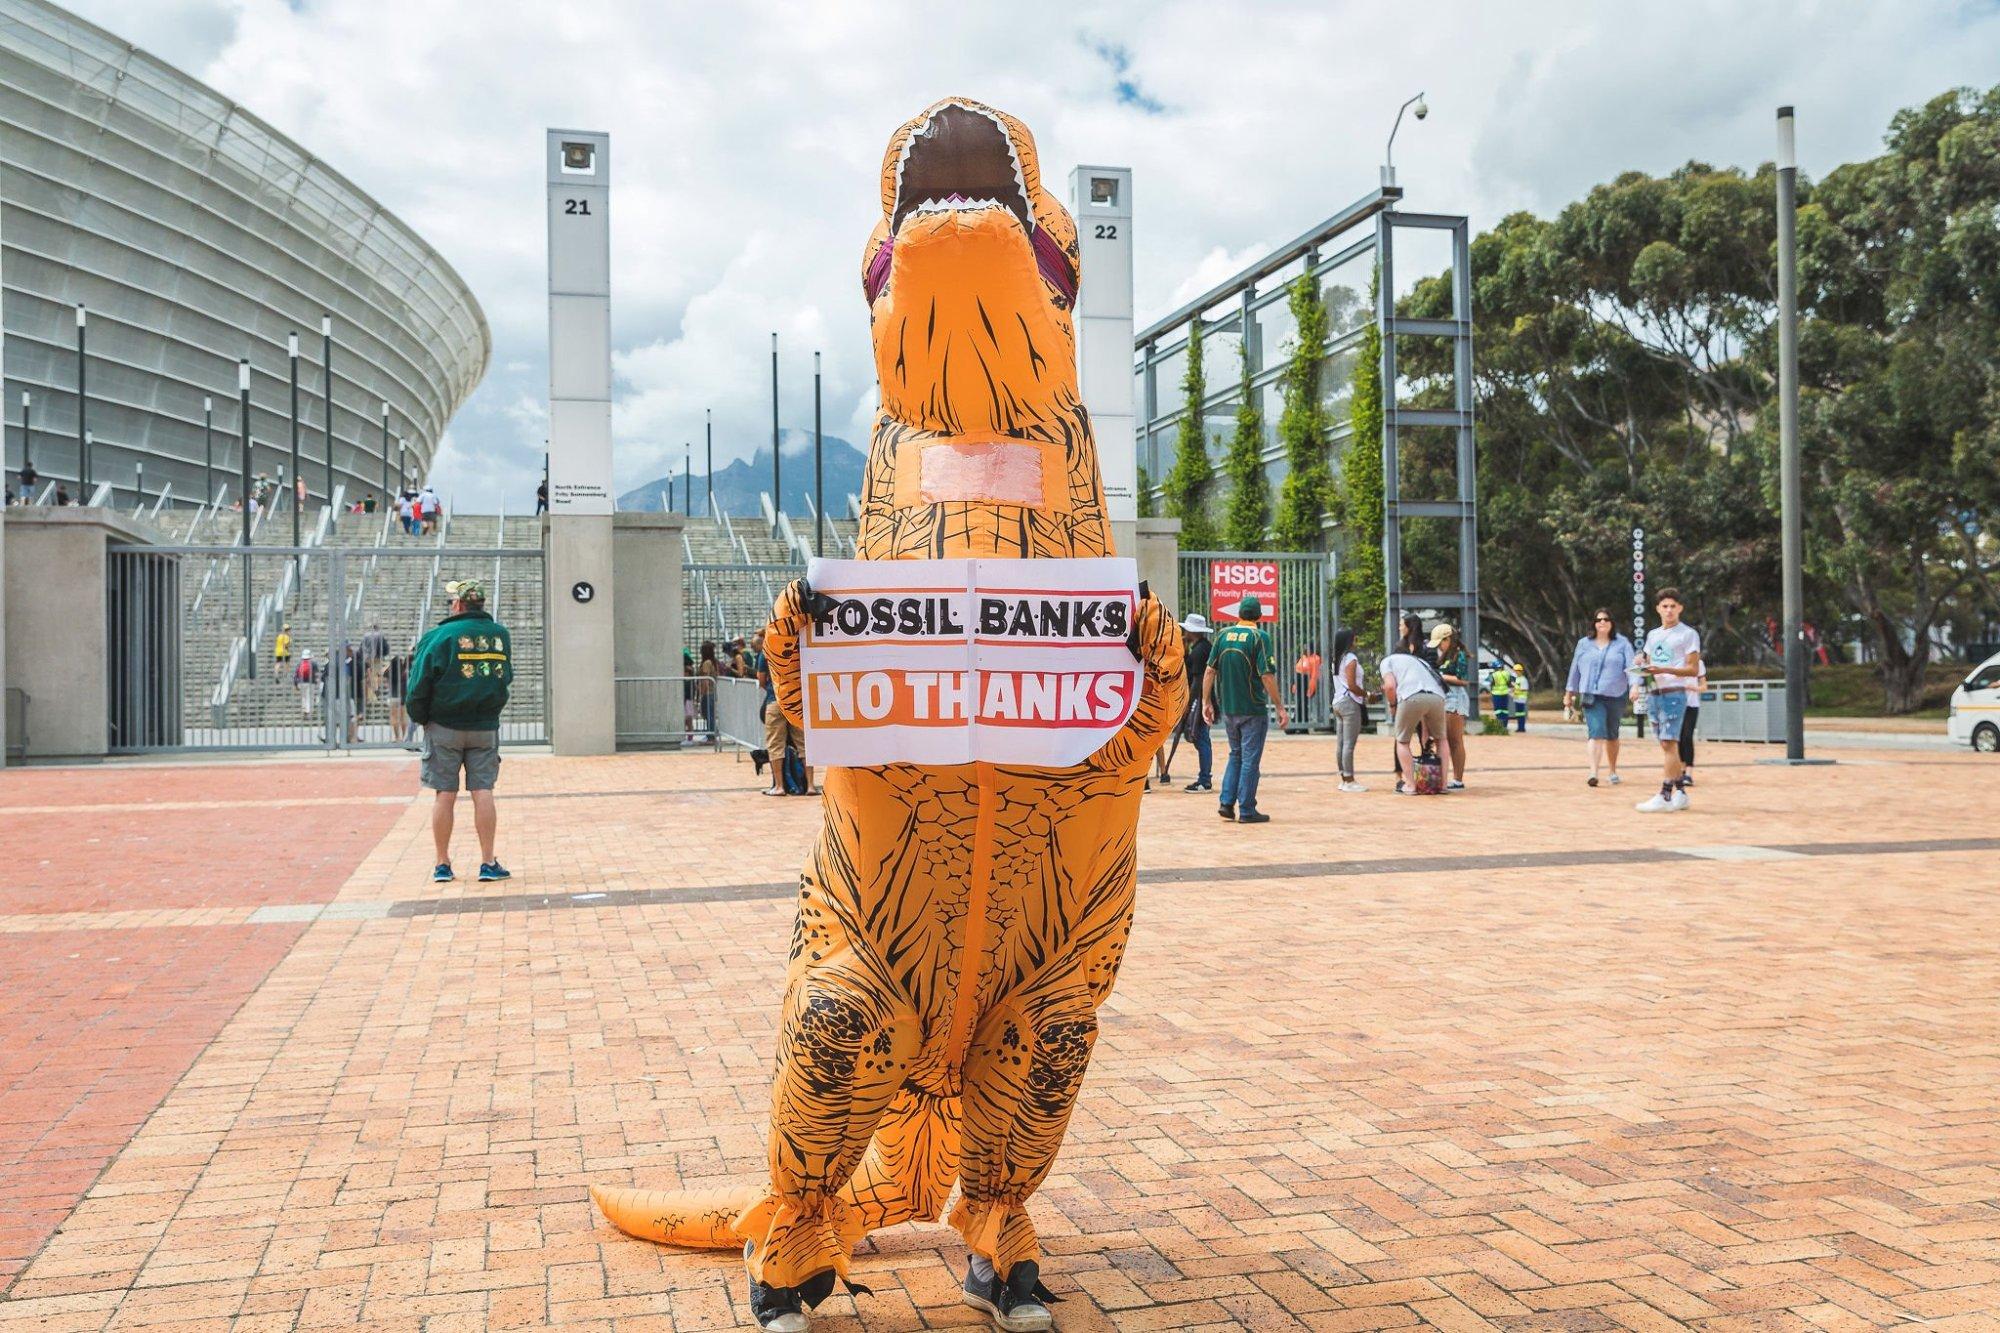 #FossilBanks No Thanks